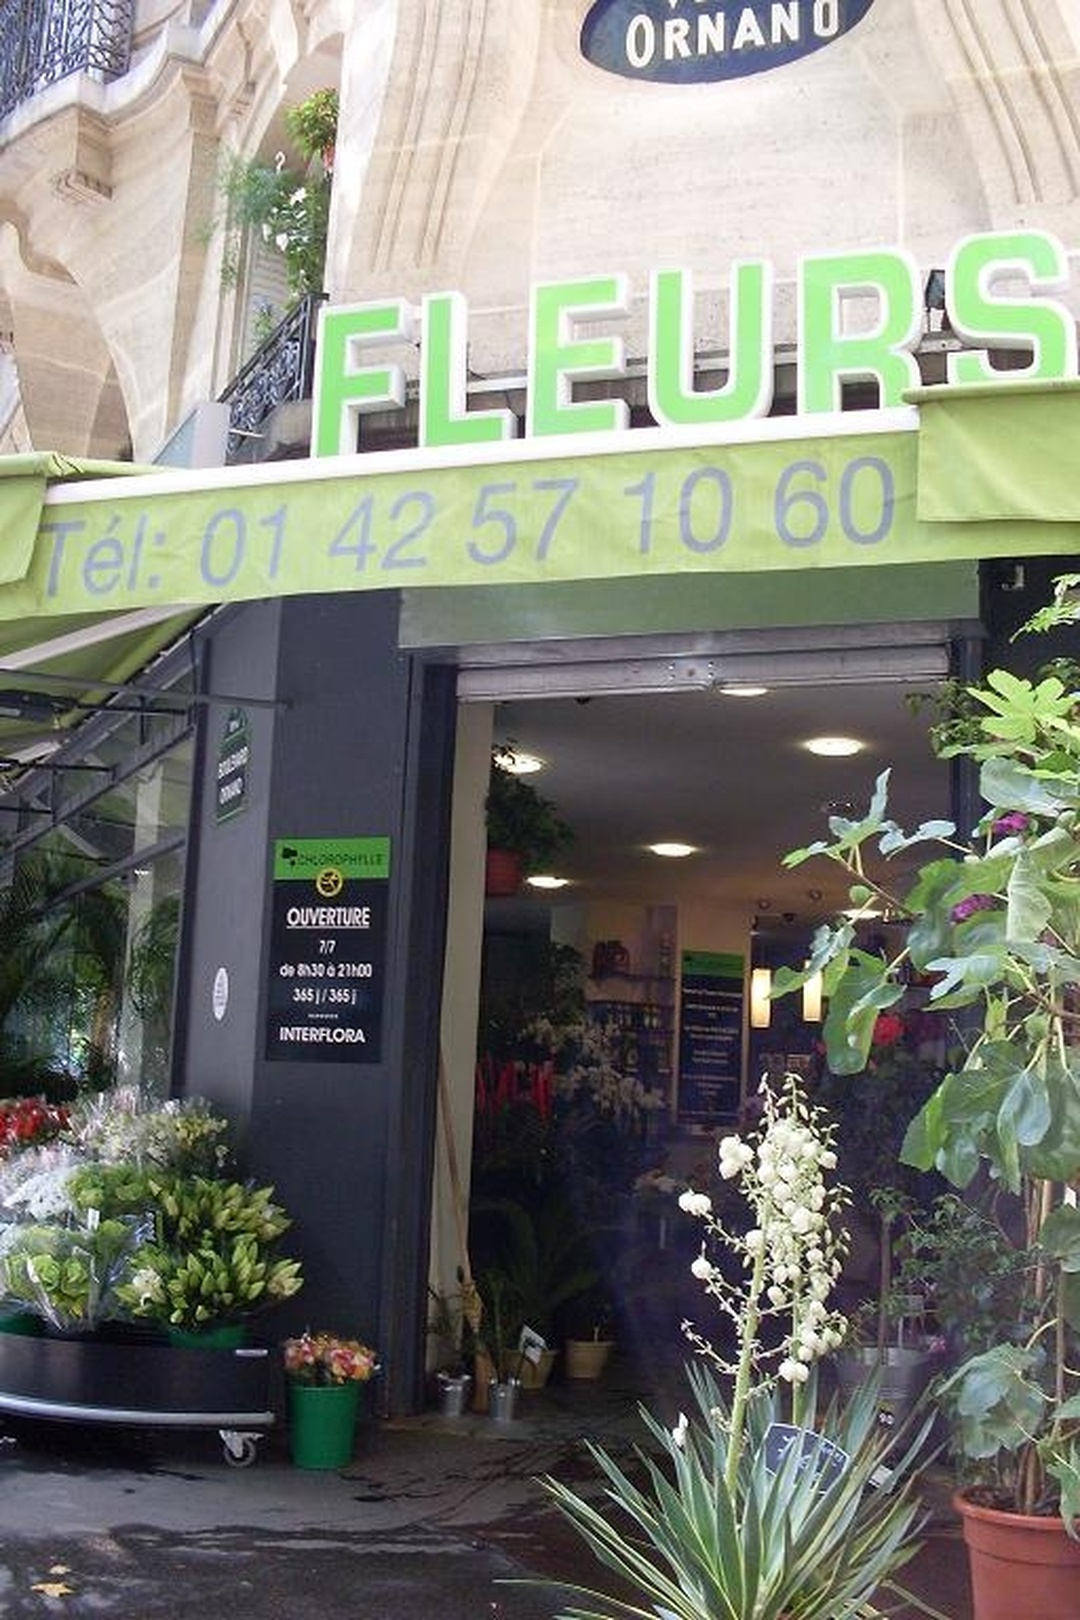 Foto vom 5. Februar 2016 18:50, Chlorophylle, 59 Boulevard Ornano, 75018 Paris, Frankreich